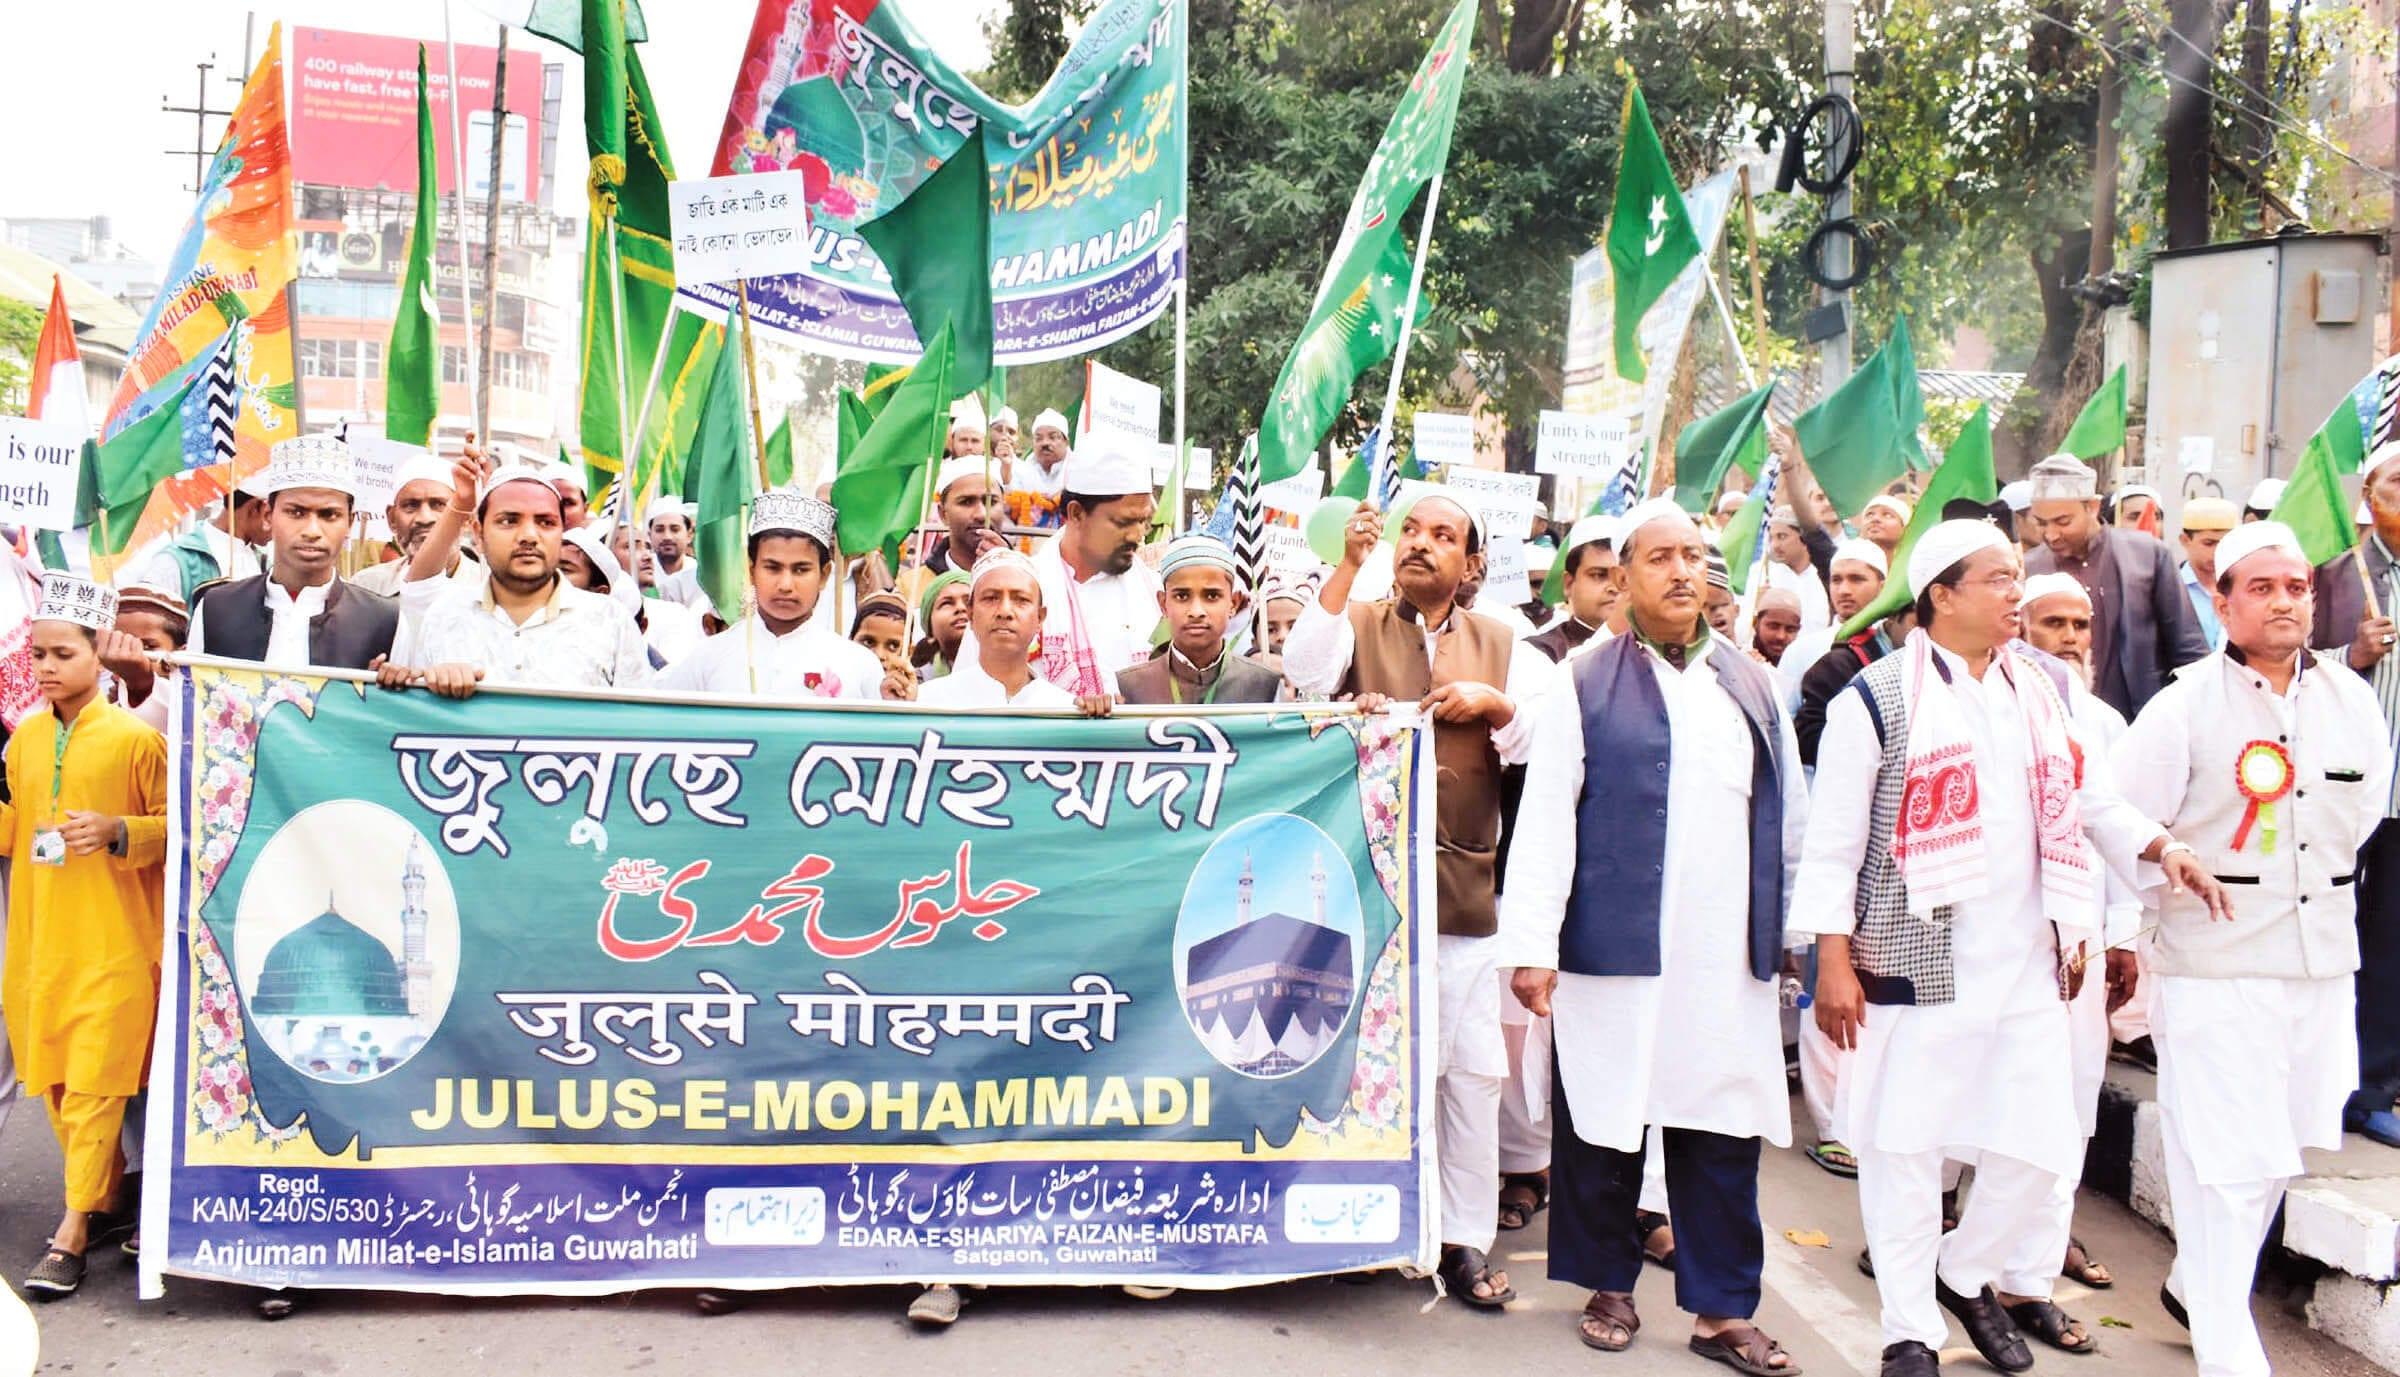 Anjuman Millat-E-Islamia observes Julush in Guwahati